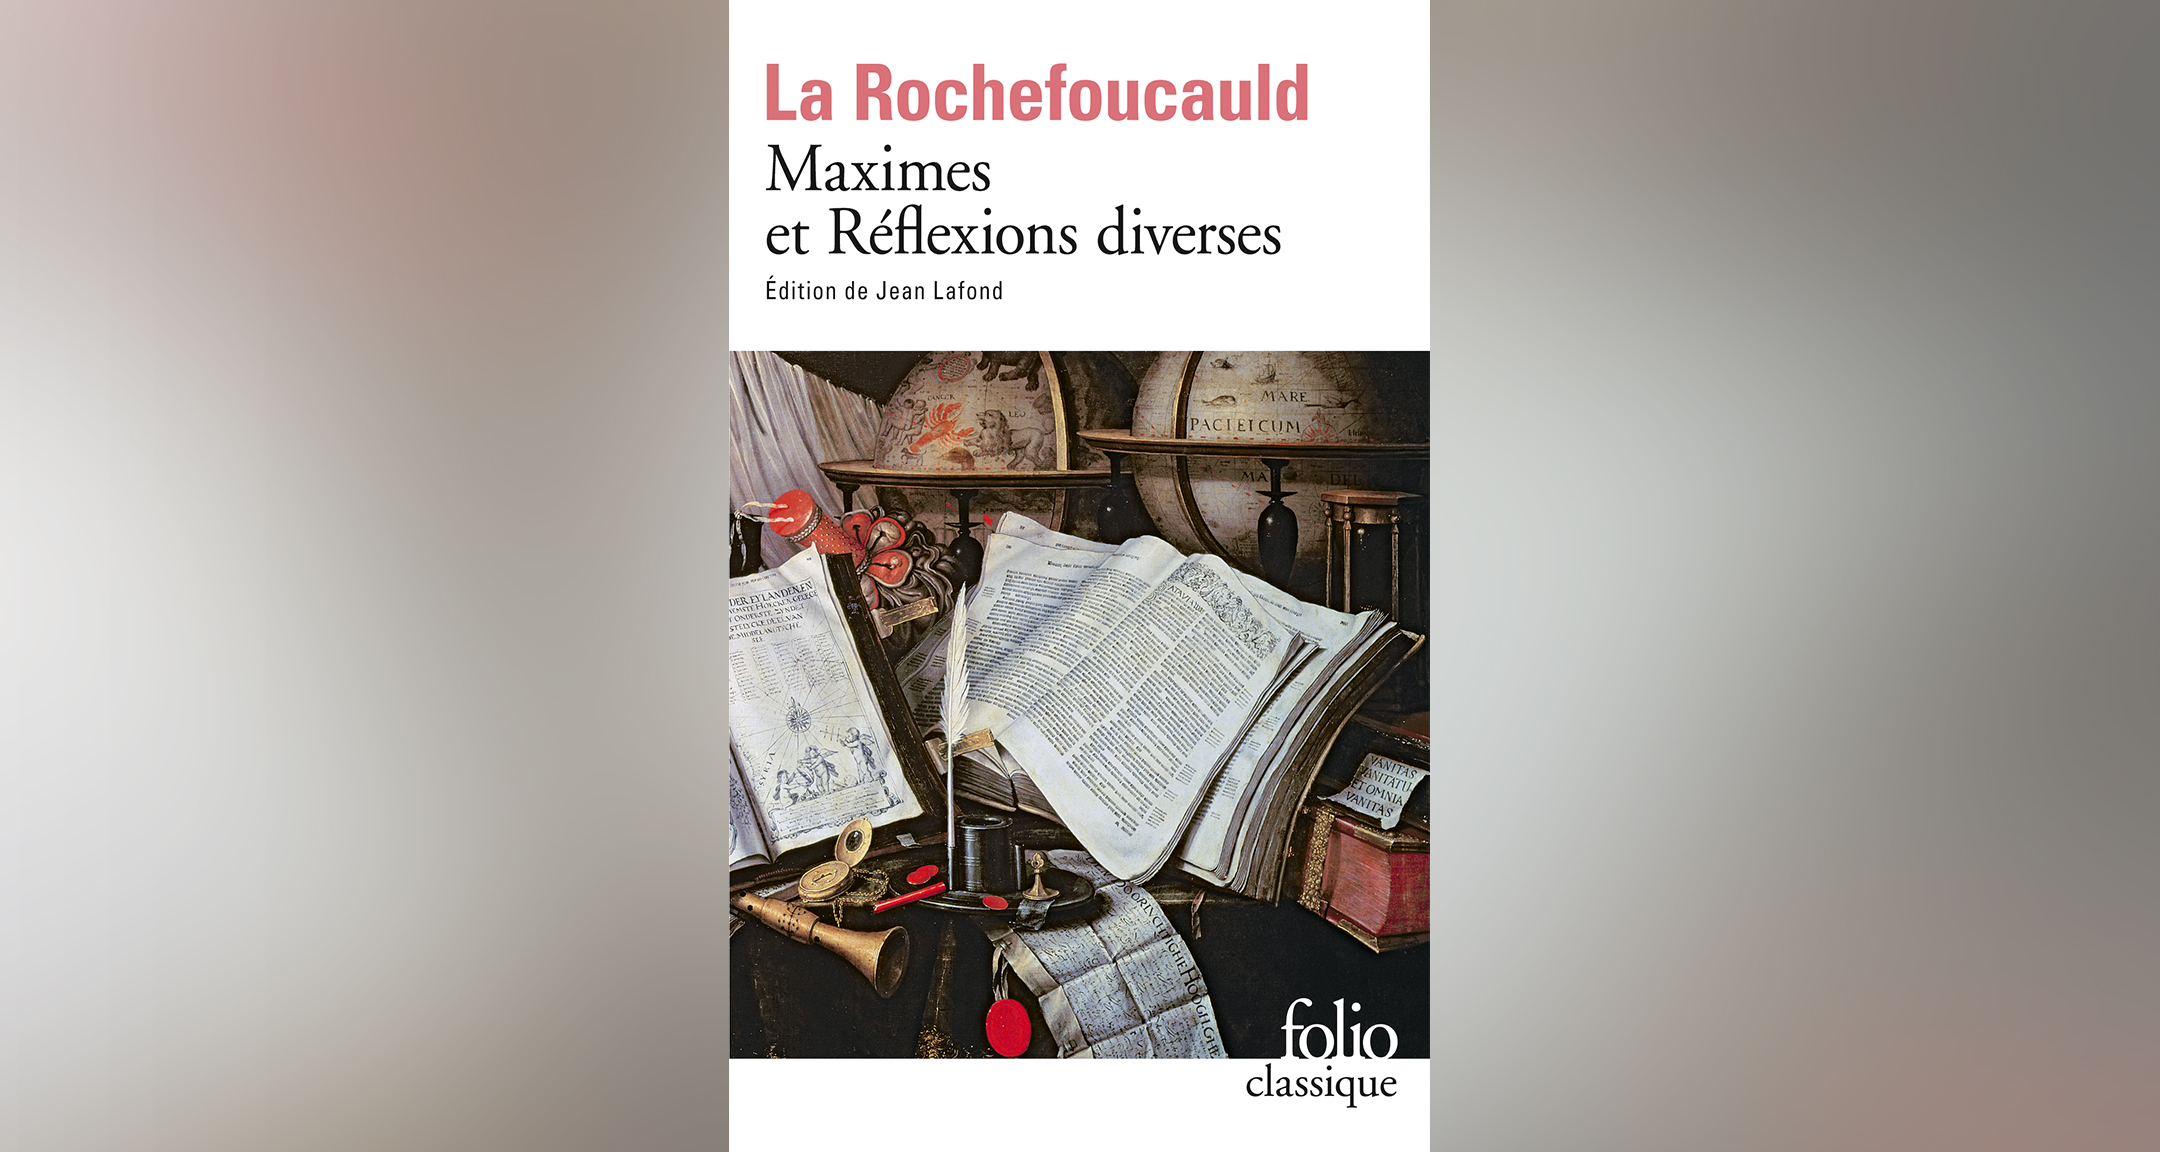 La Rochefoucauld, Maximes et réflexions diverses